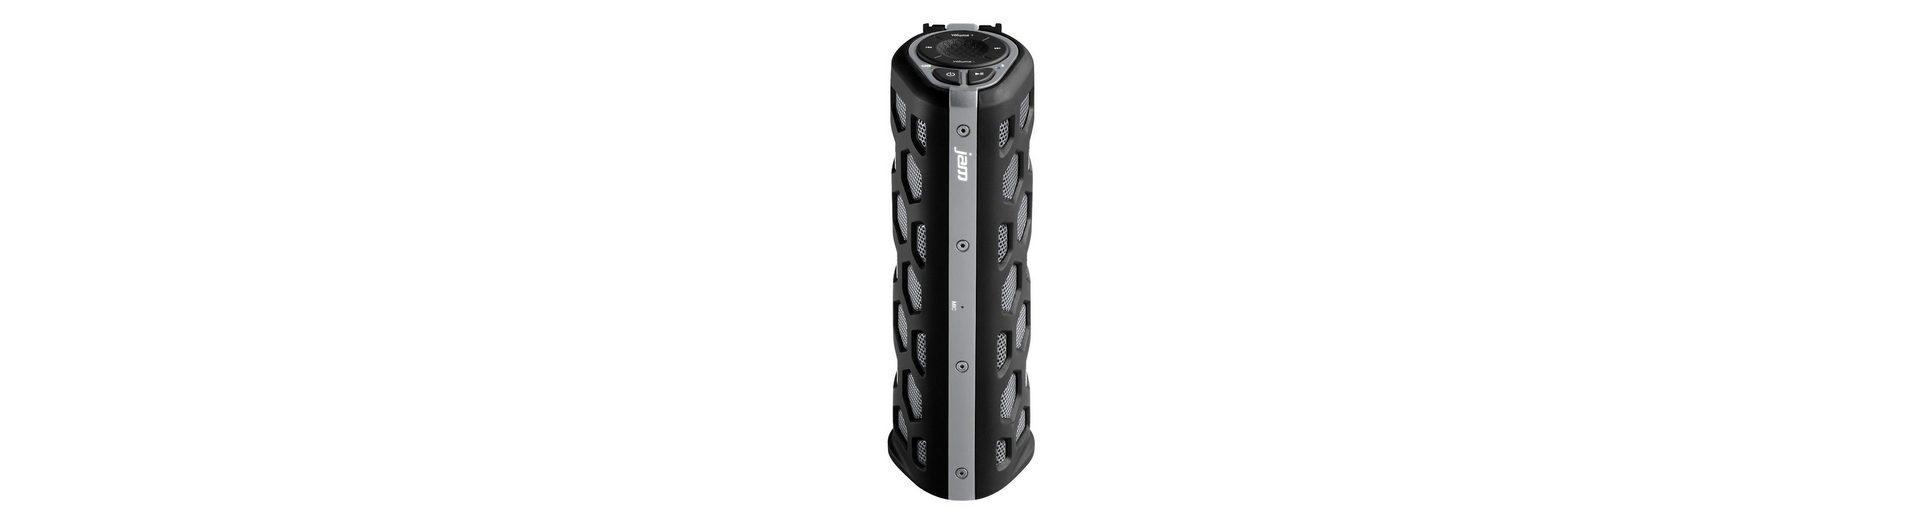 JAM Bluetooth Lautsprecher »JAM STREET, HX-P710-EU«